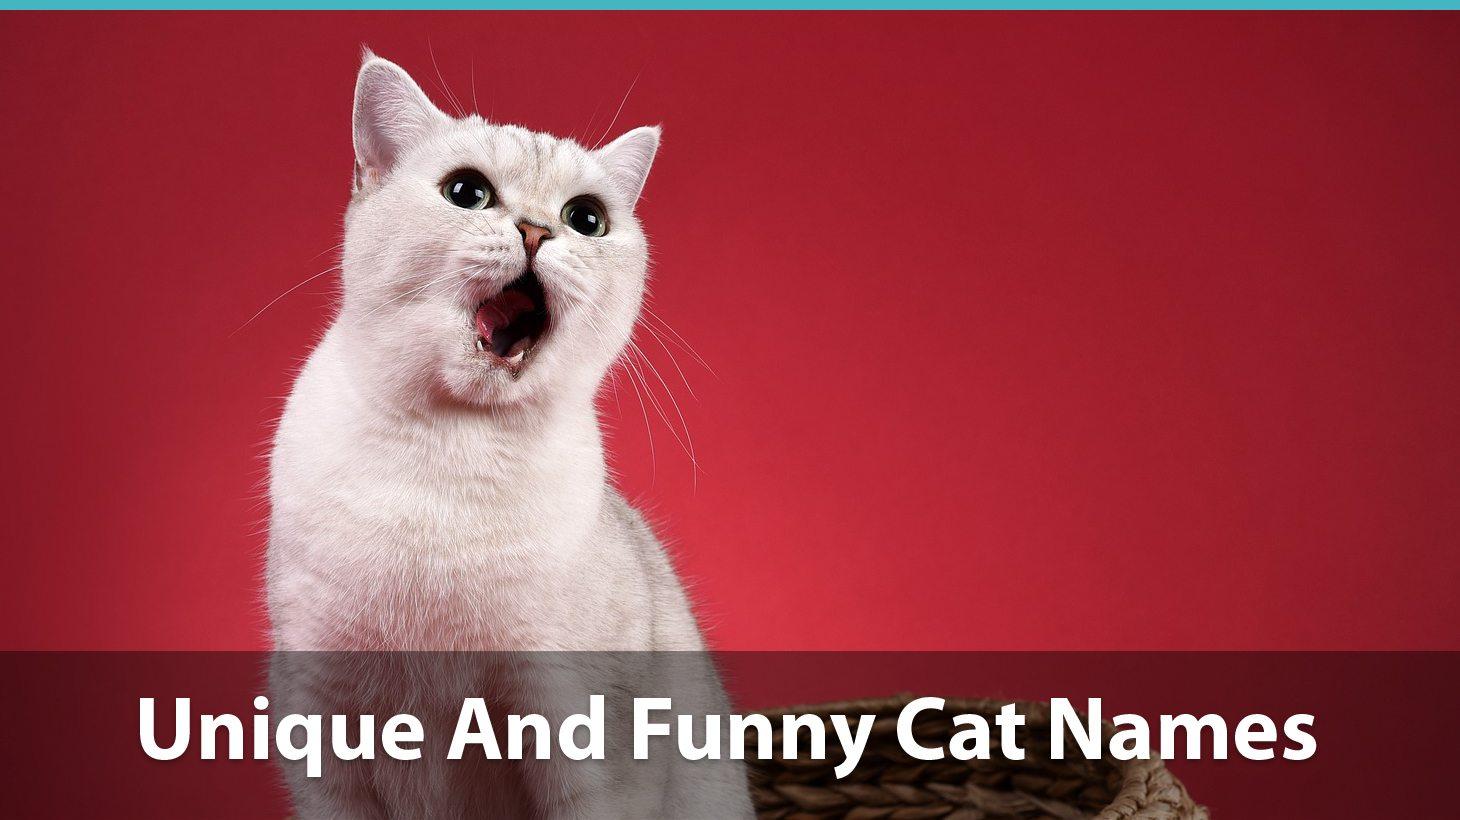 Top 200+ Unique Cat Names: Puns, Funny Options, And More!